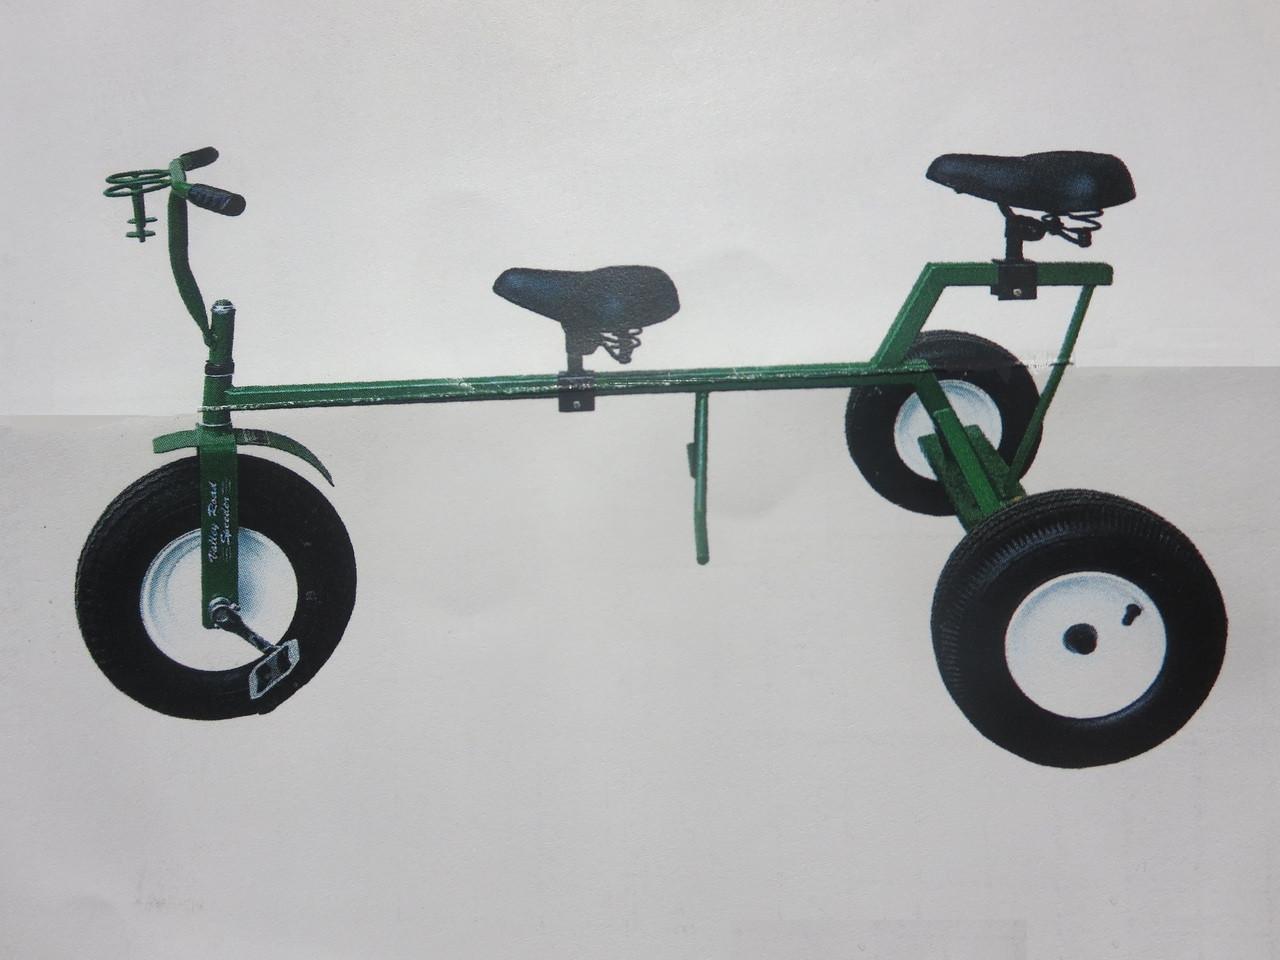 Valley Road Speeder Wagon Seat Wwwmiifotoscom